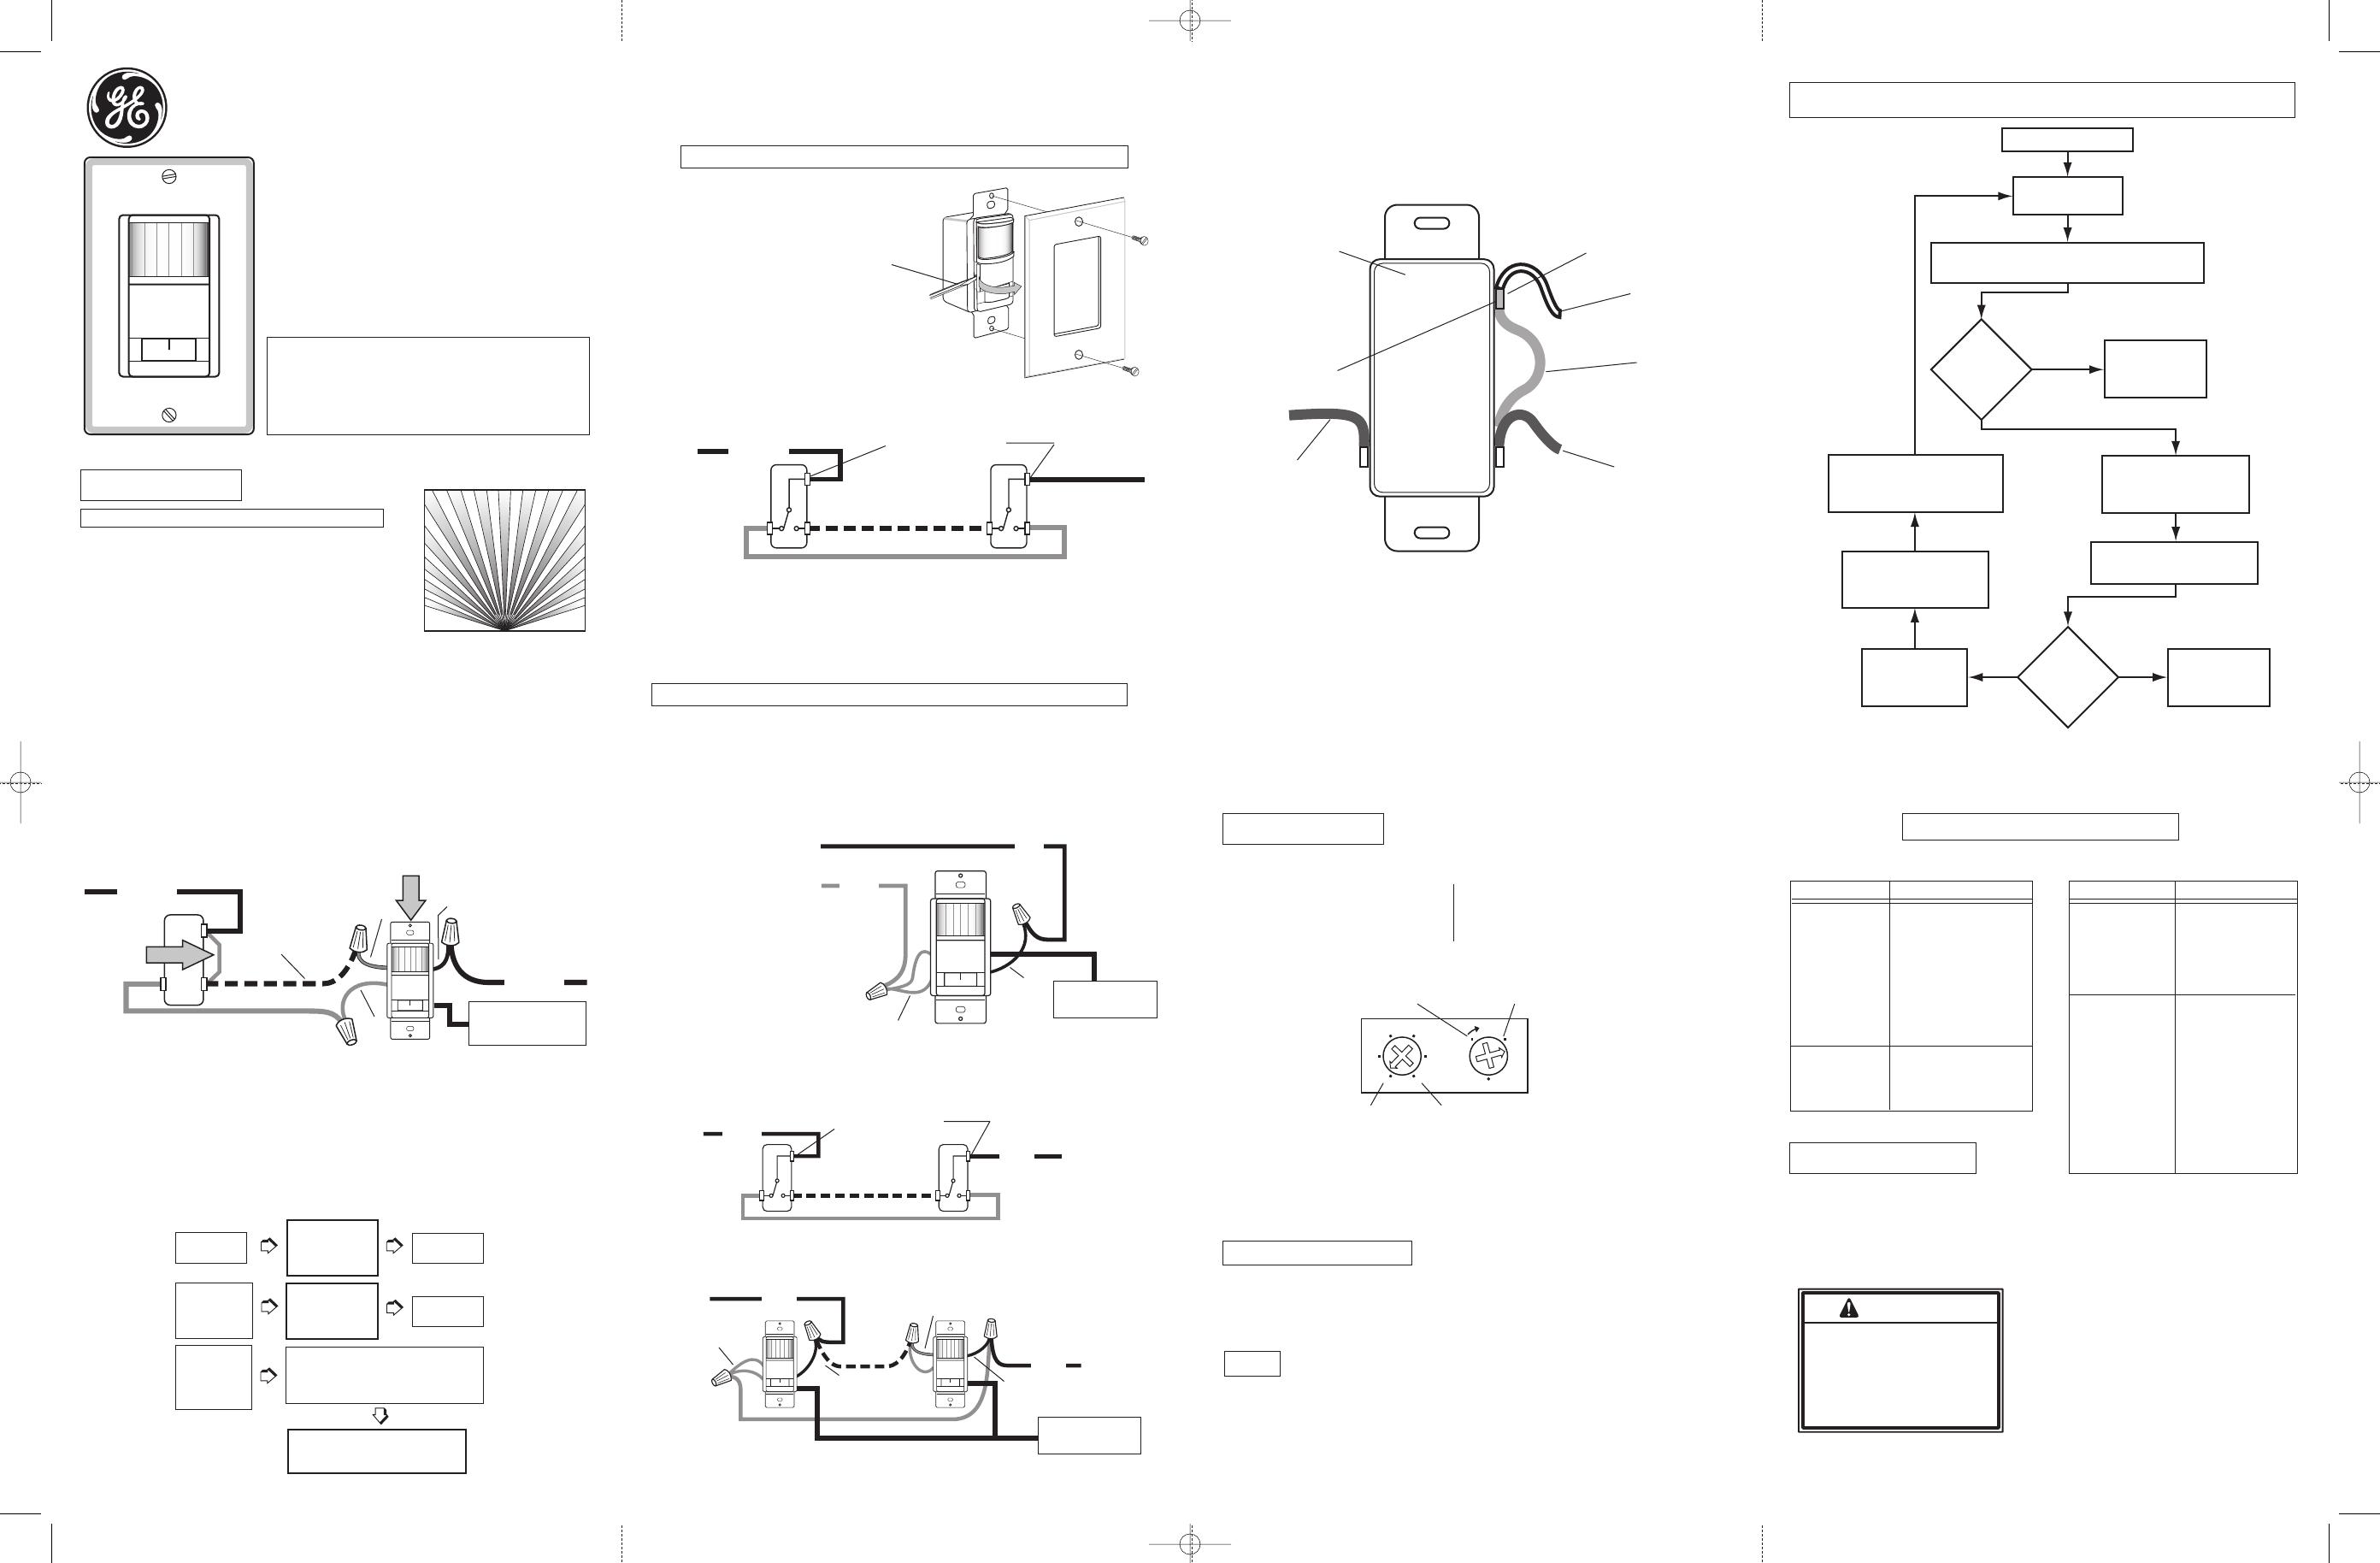 Heath Zenith Motion Detector Wiring Diagram   Wiring Diagram - Heath Zenith Motion Sensor Light Wiring Diagram